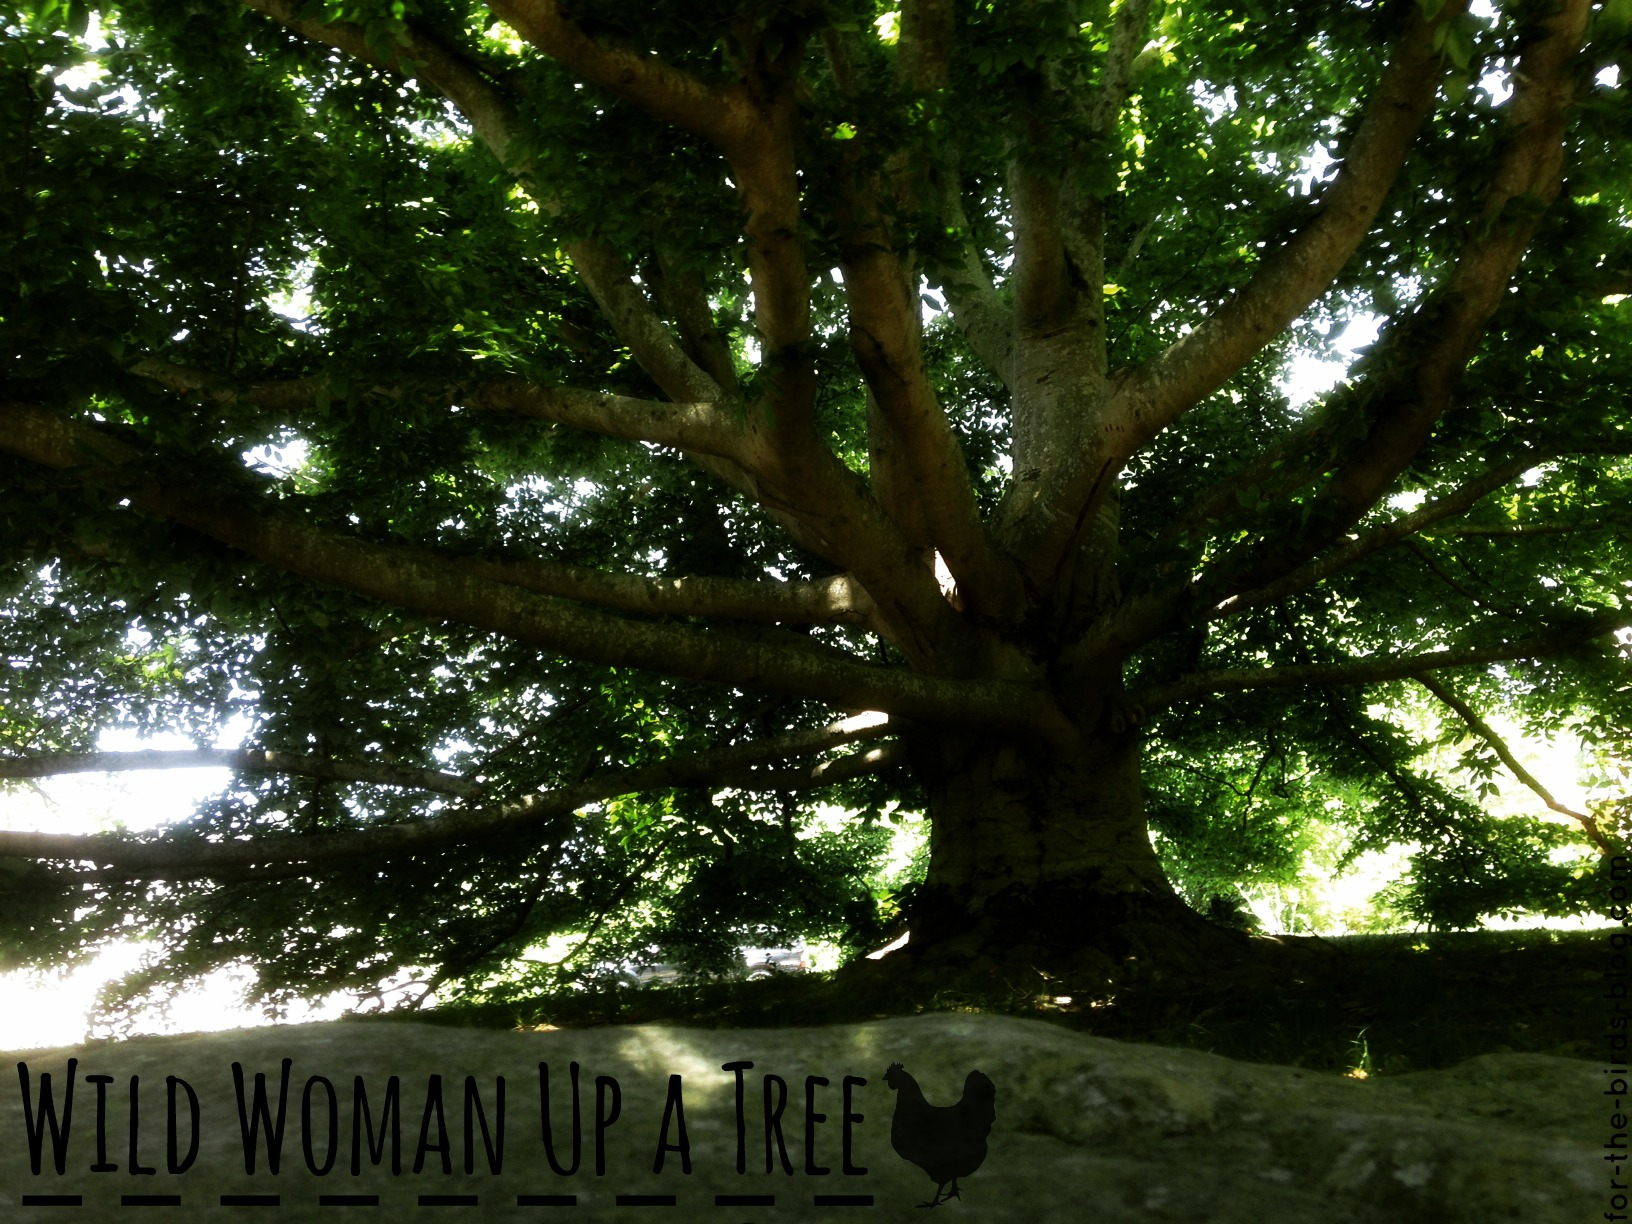 Wild Woman Up a Tree